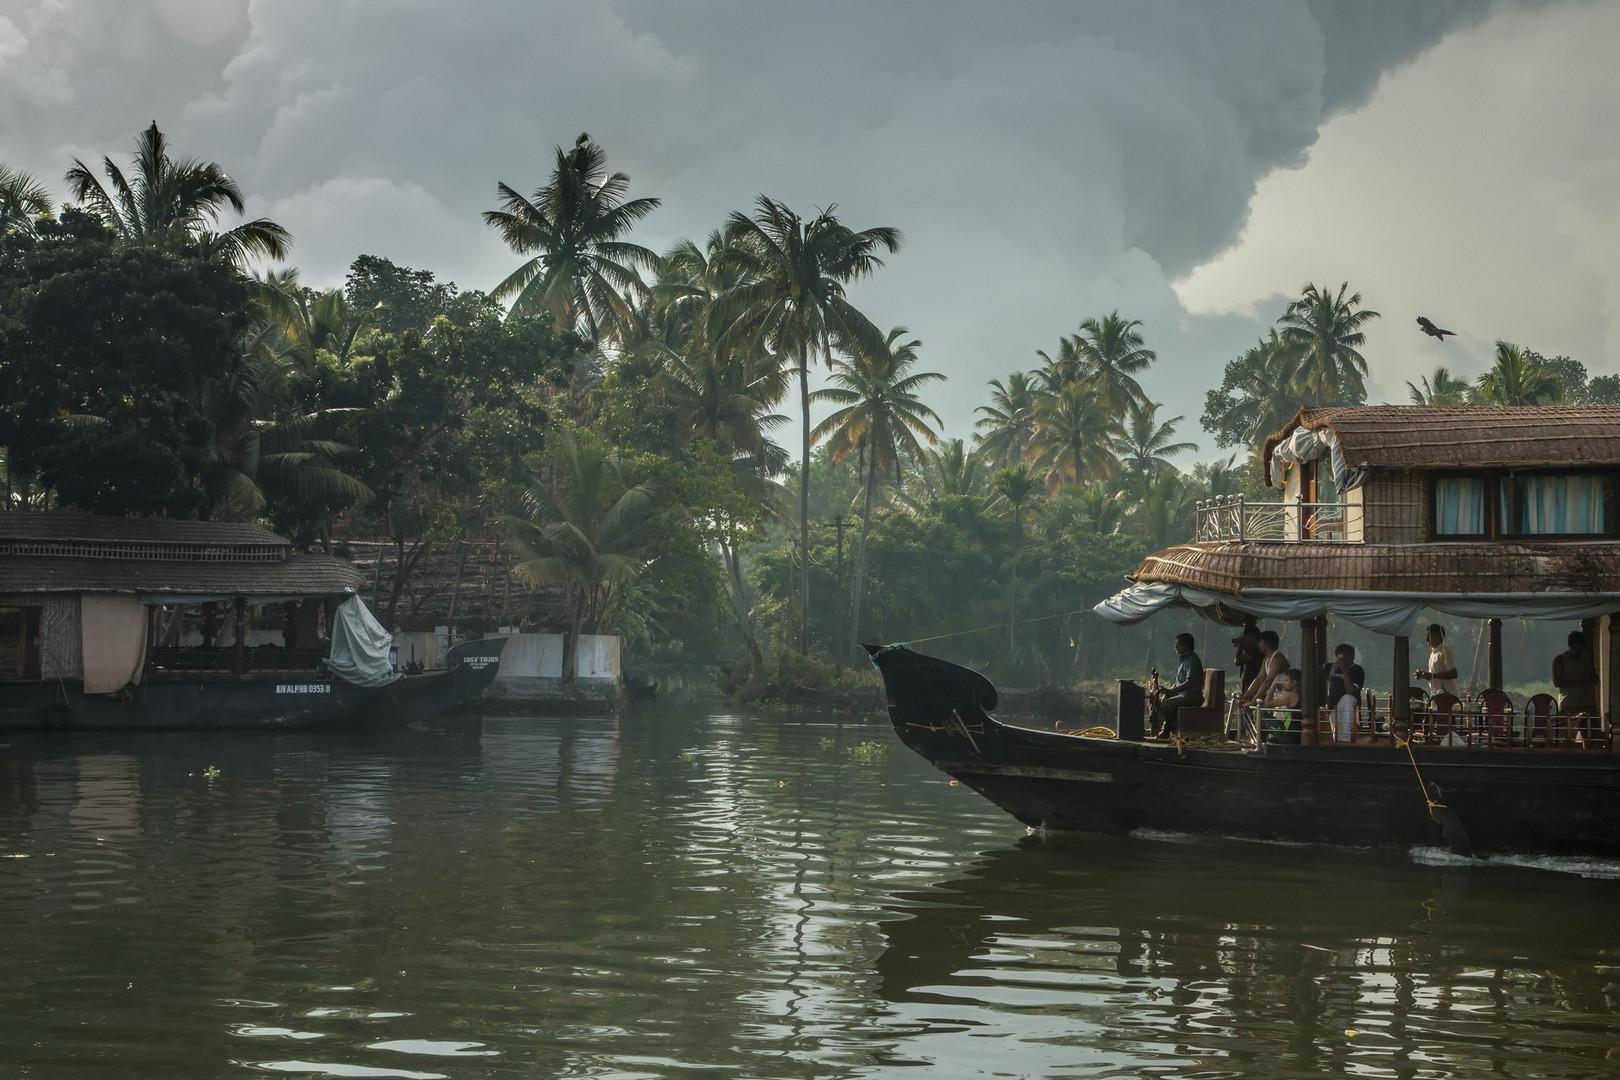 Backwaters au petit matin